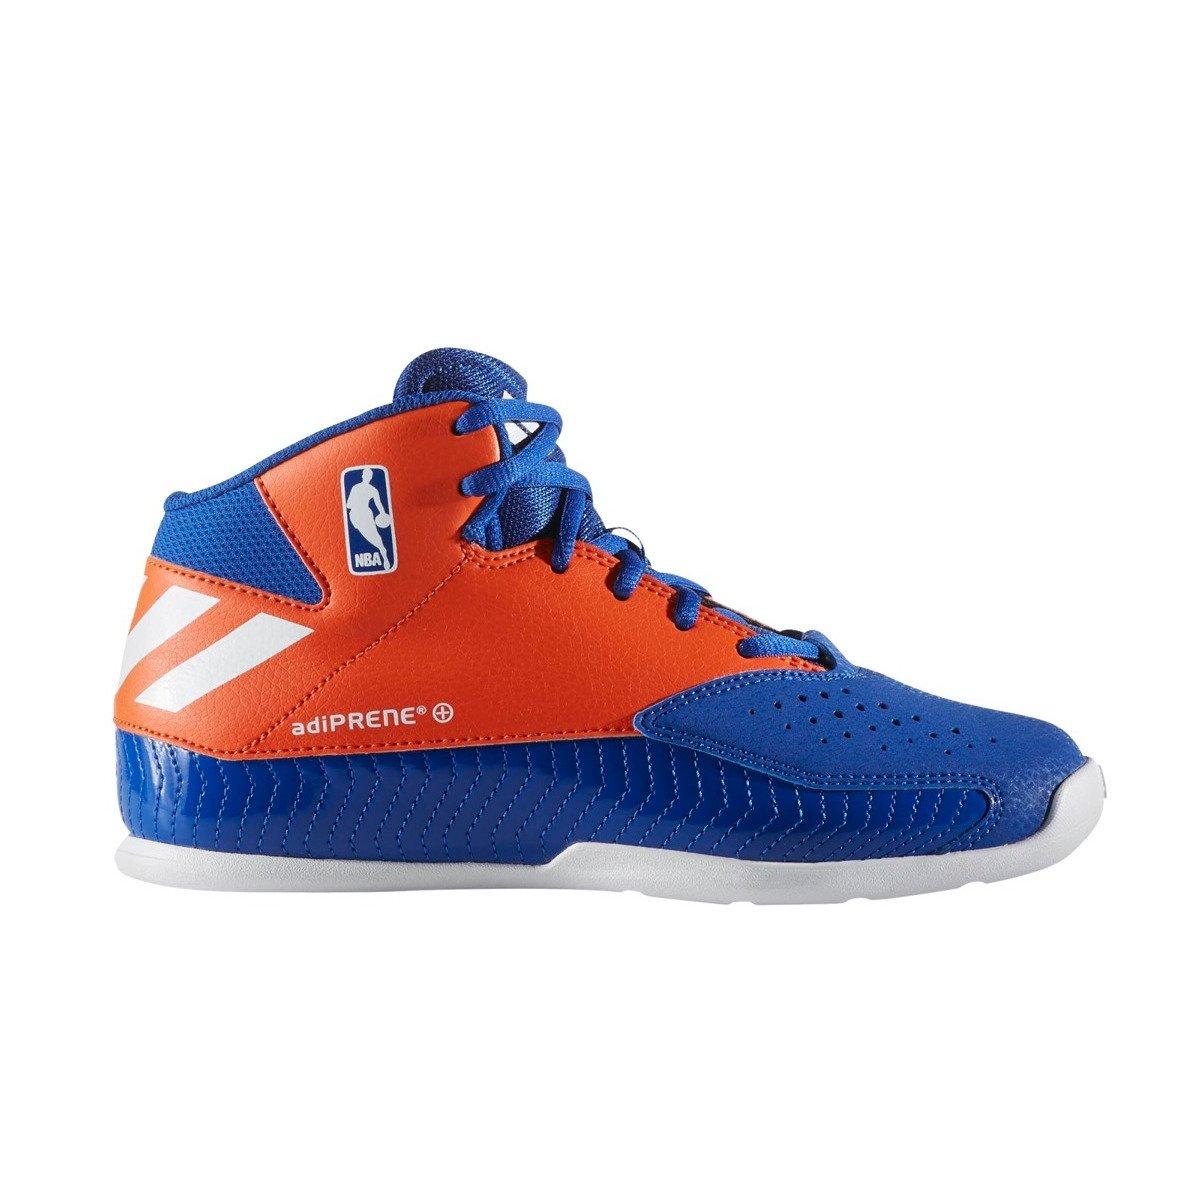 a1bb72b0 Buty Adidas Next Level Speed 5 NBA - BW0501 - Basketo.pl